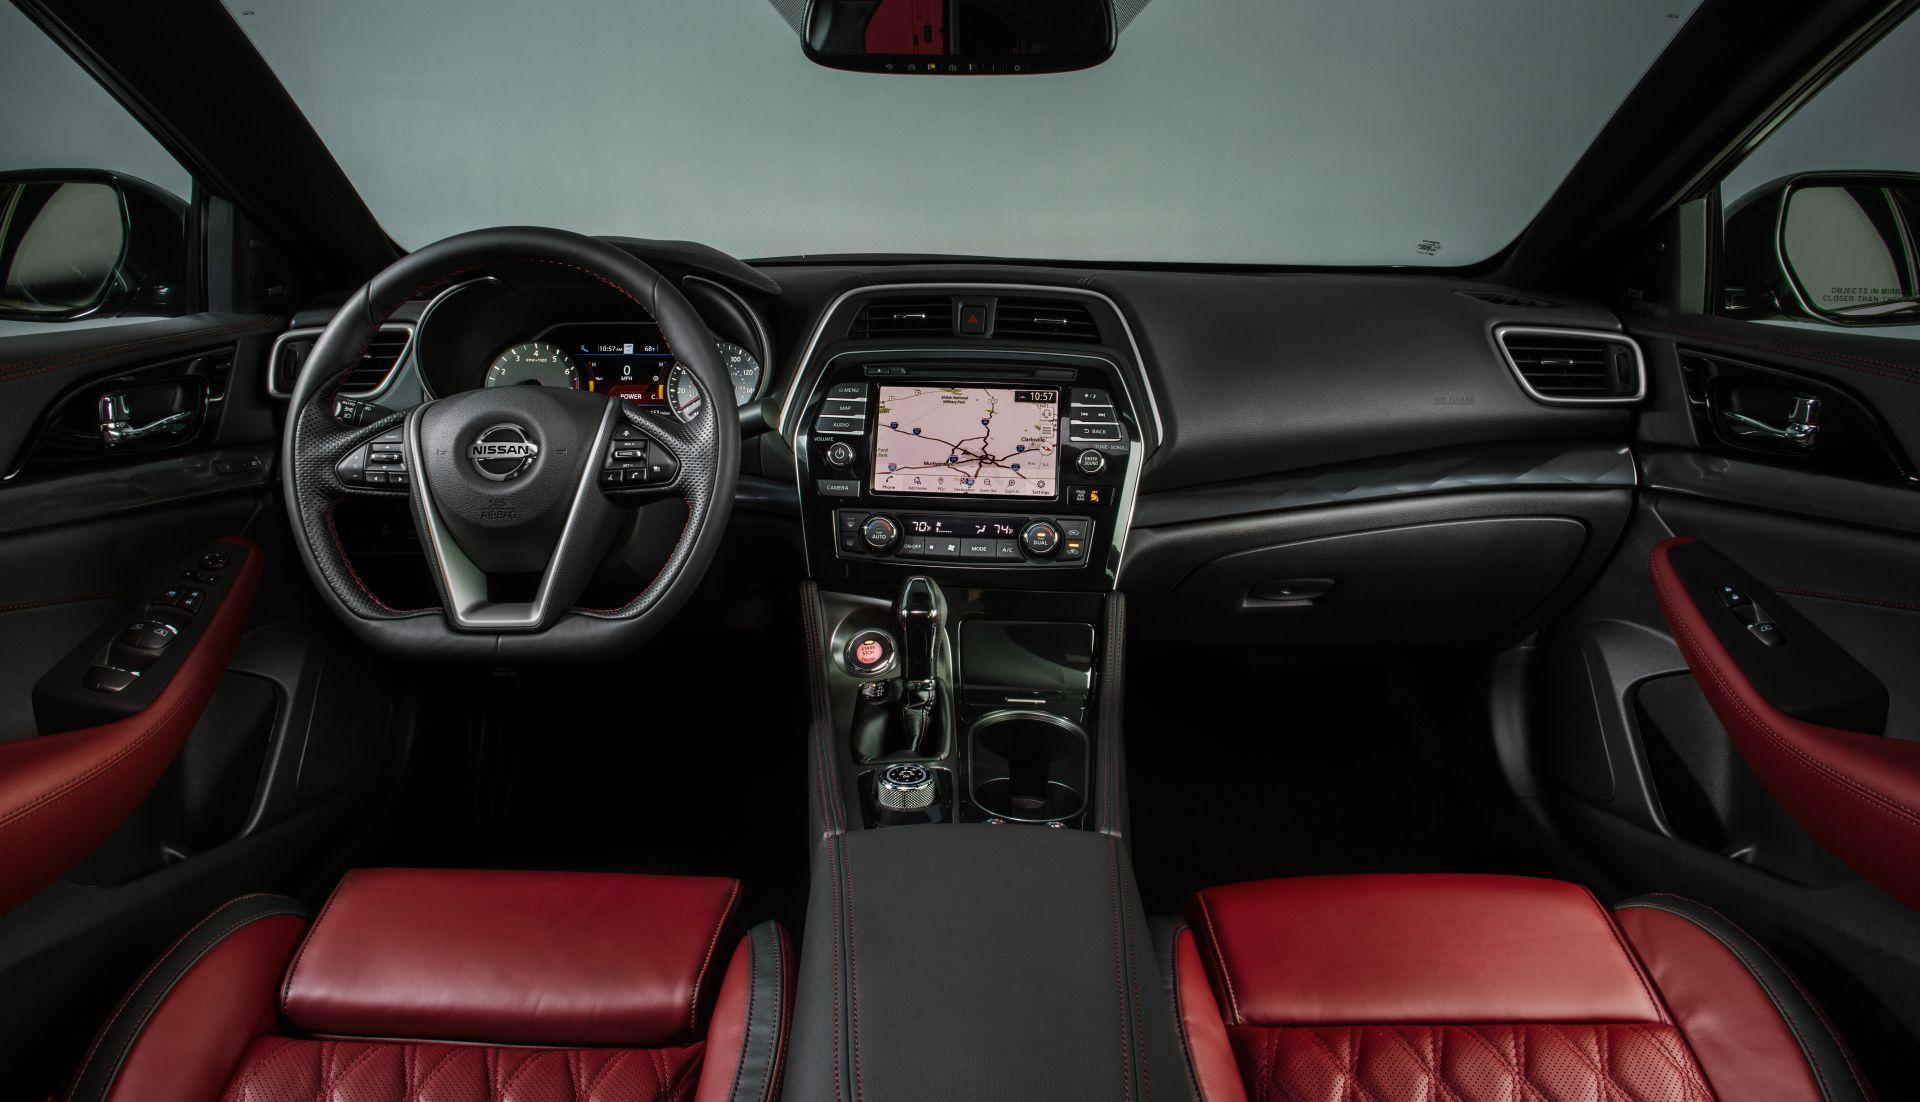 Nissan-Maxima-40th-Anniversary-Edition-13